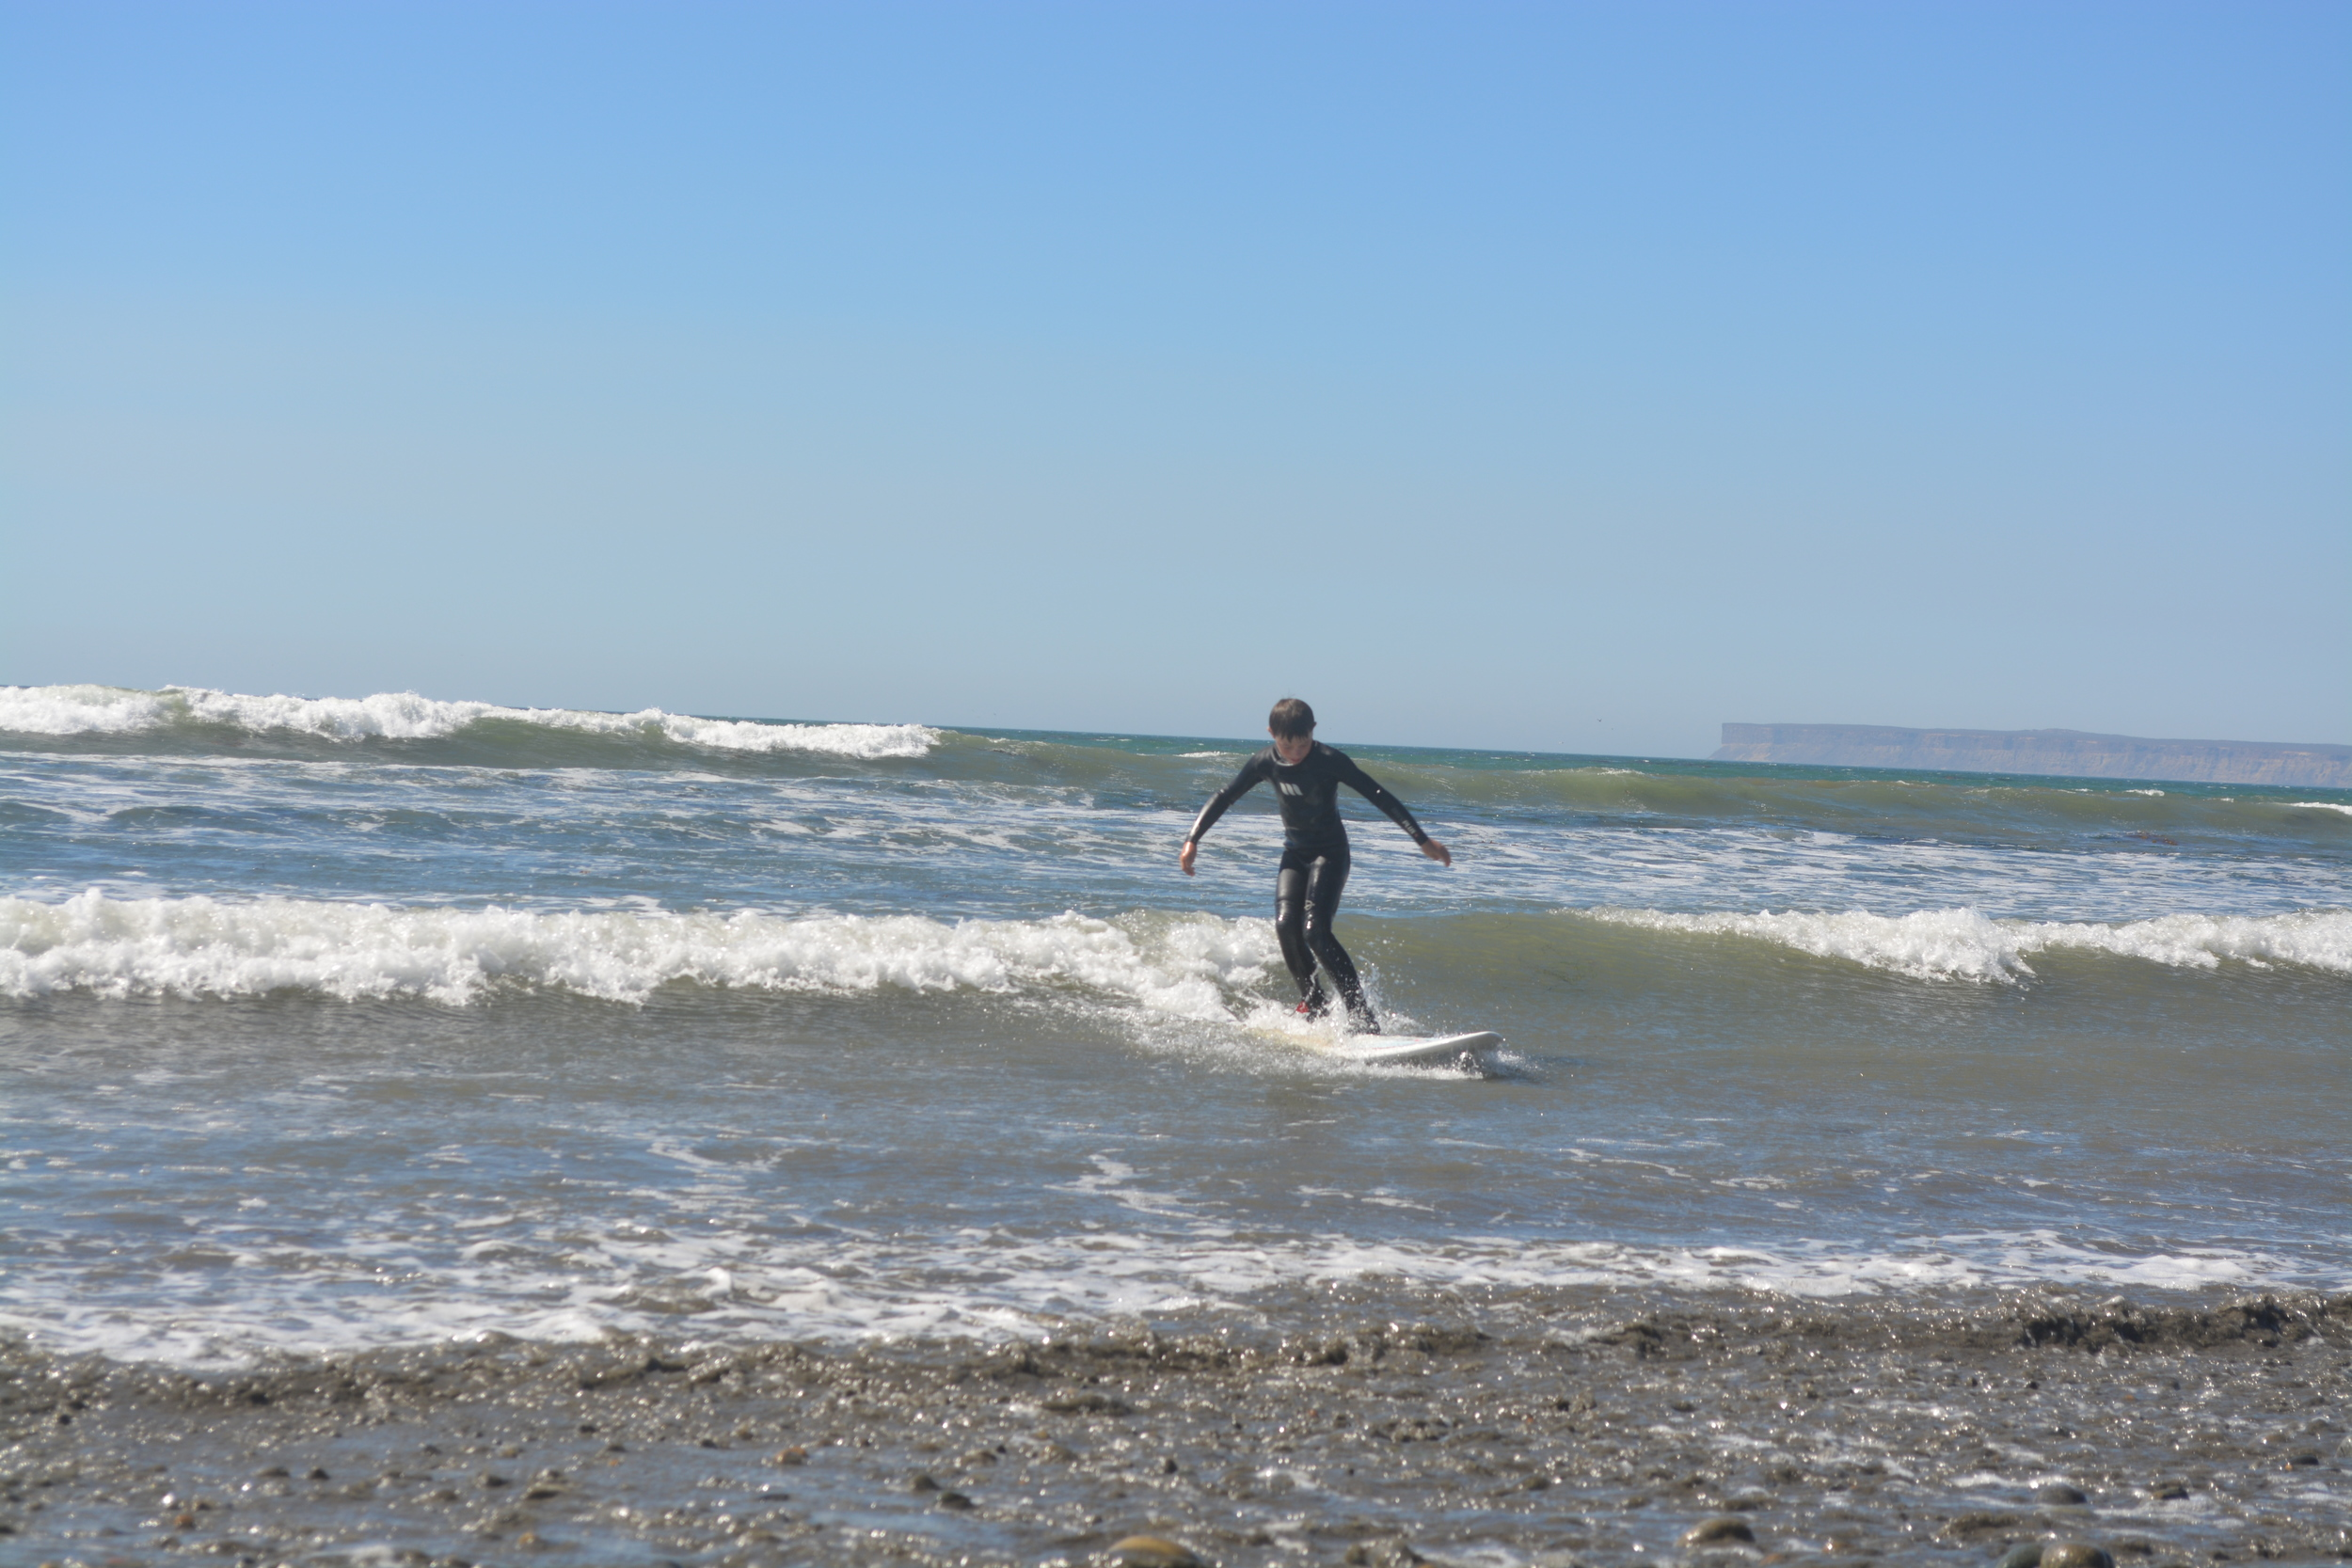 Baja California 10-5-13 Shipwrecks Surfing Adventure Ocean Experience Surf School San Diego (18).JPG